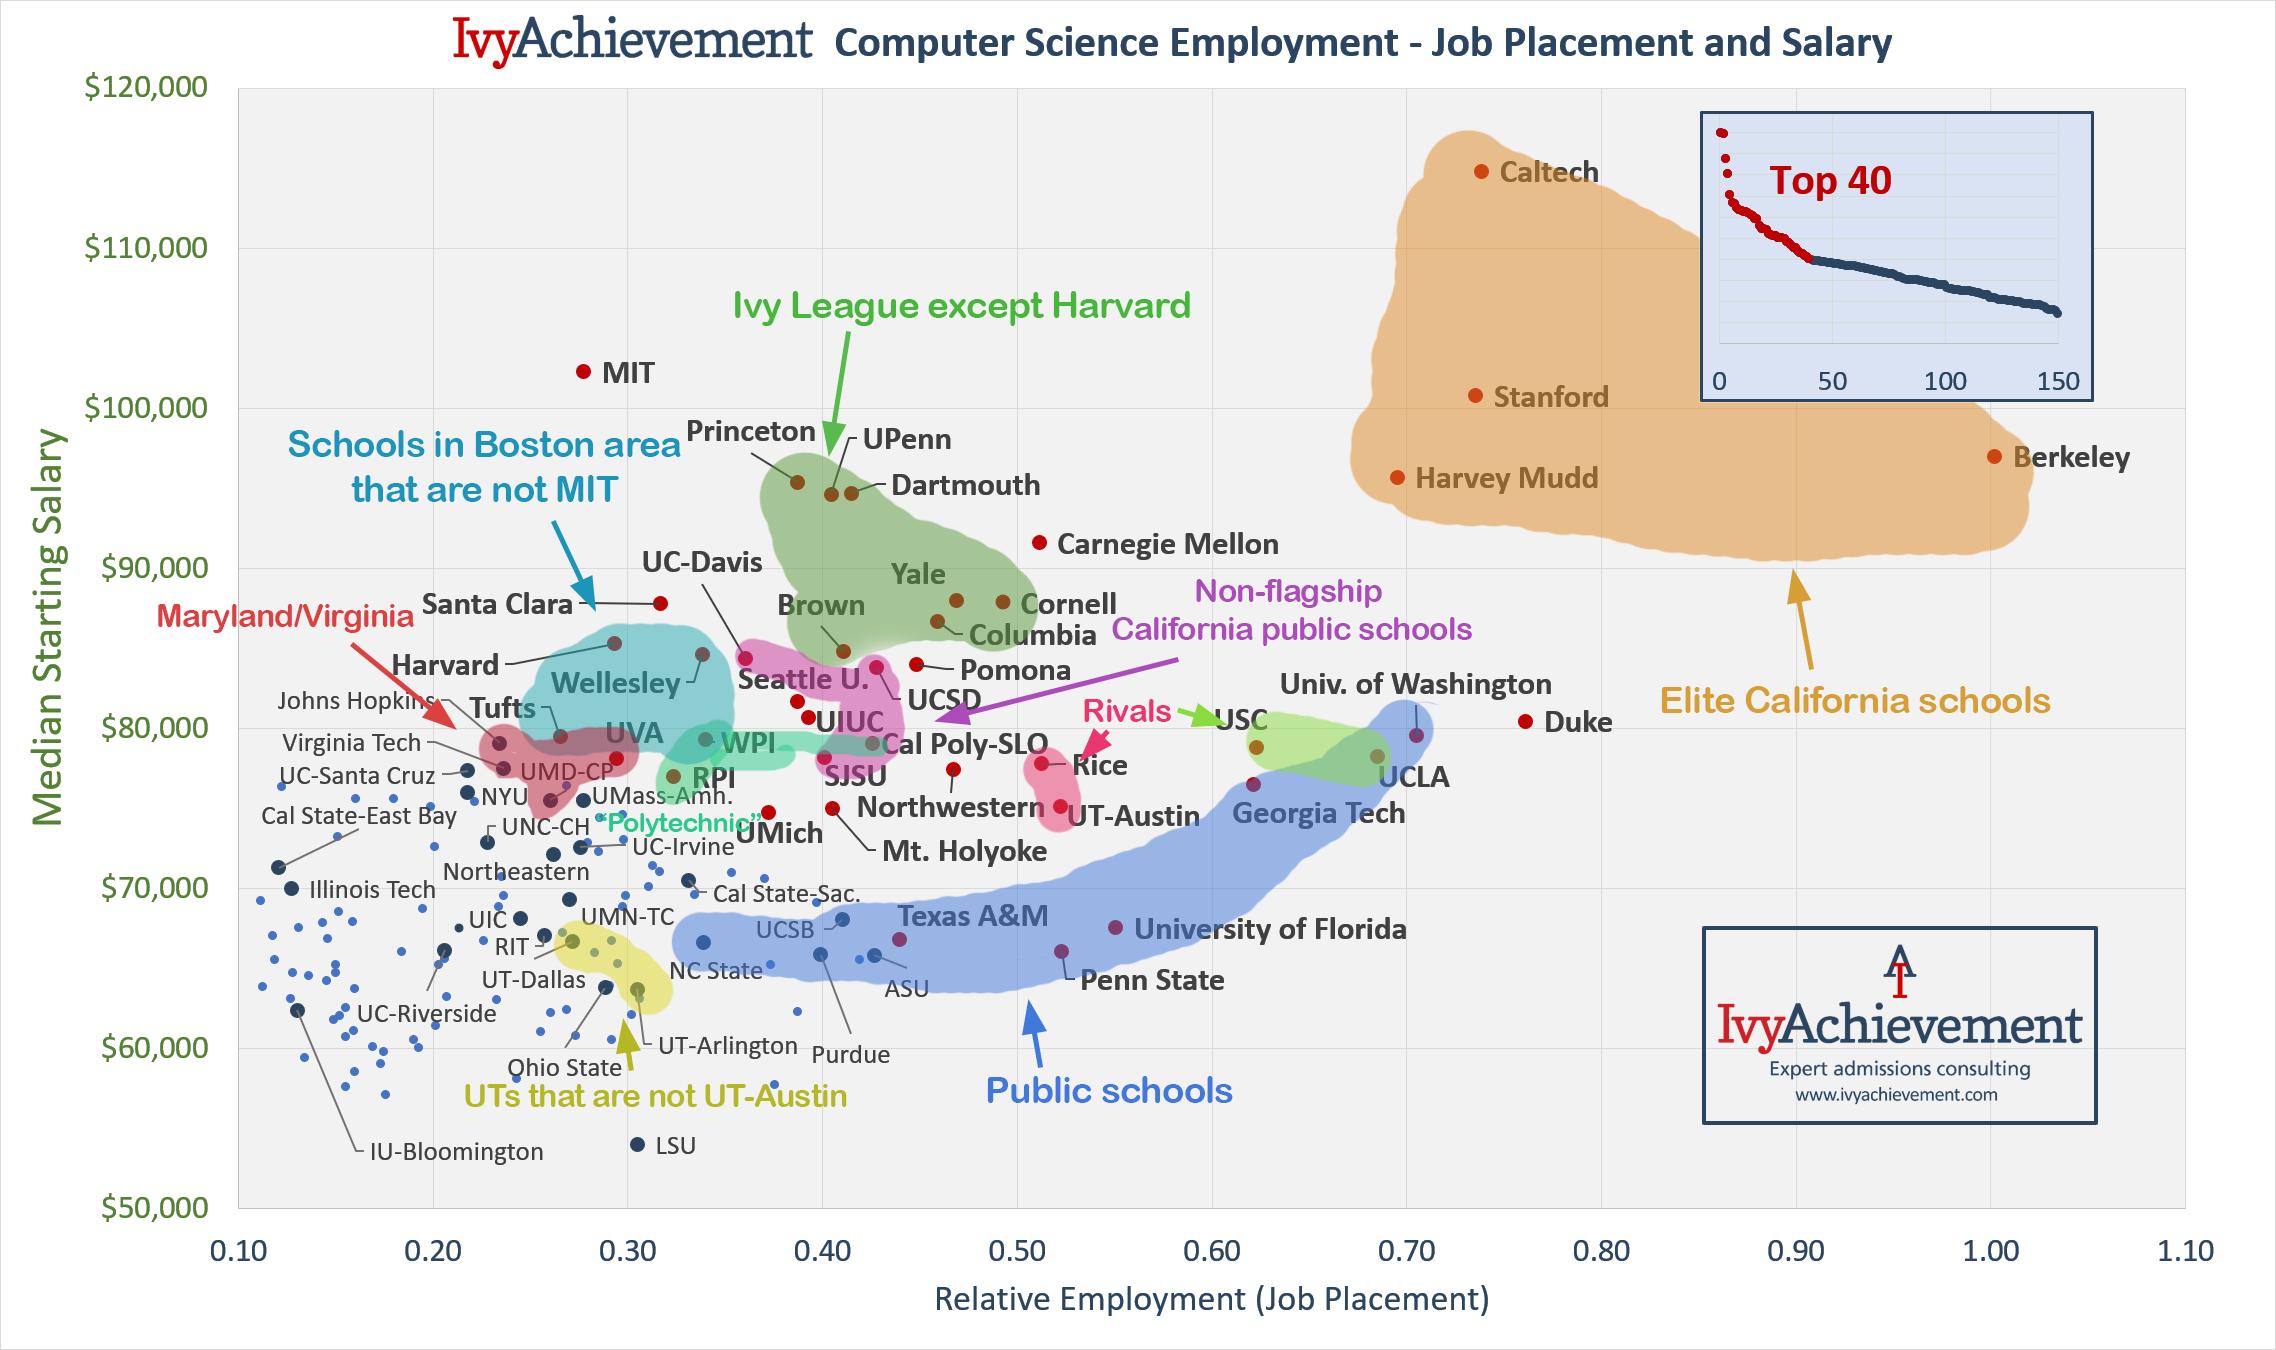 IvyAchievement CS Employment - relative vs salary observations